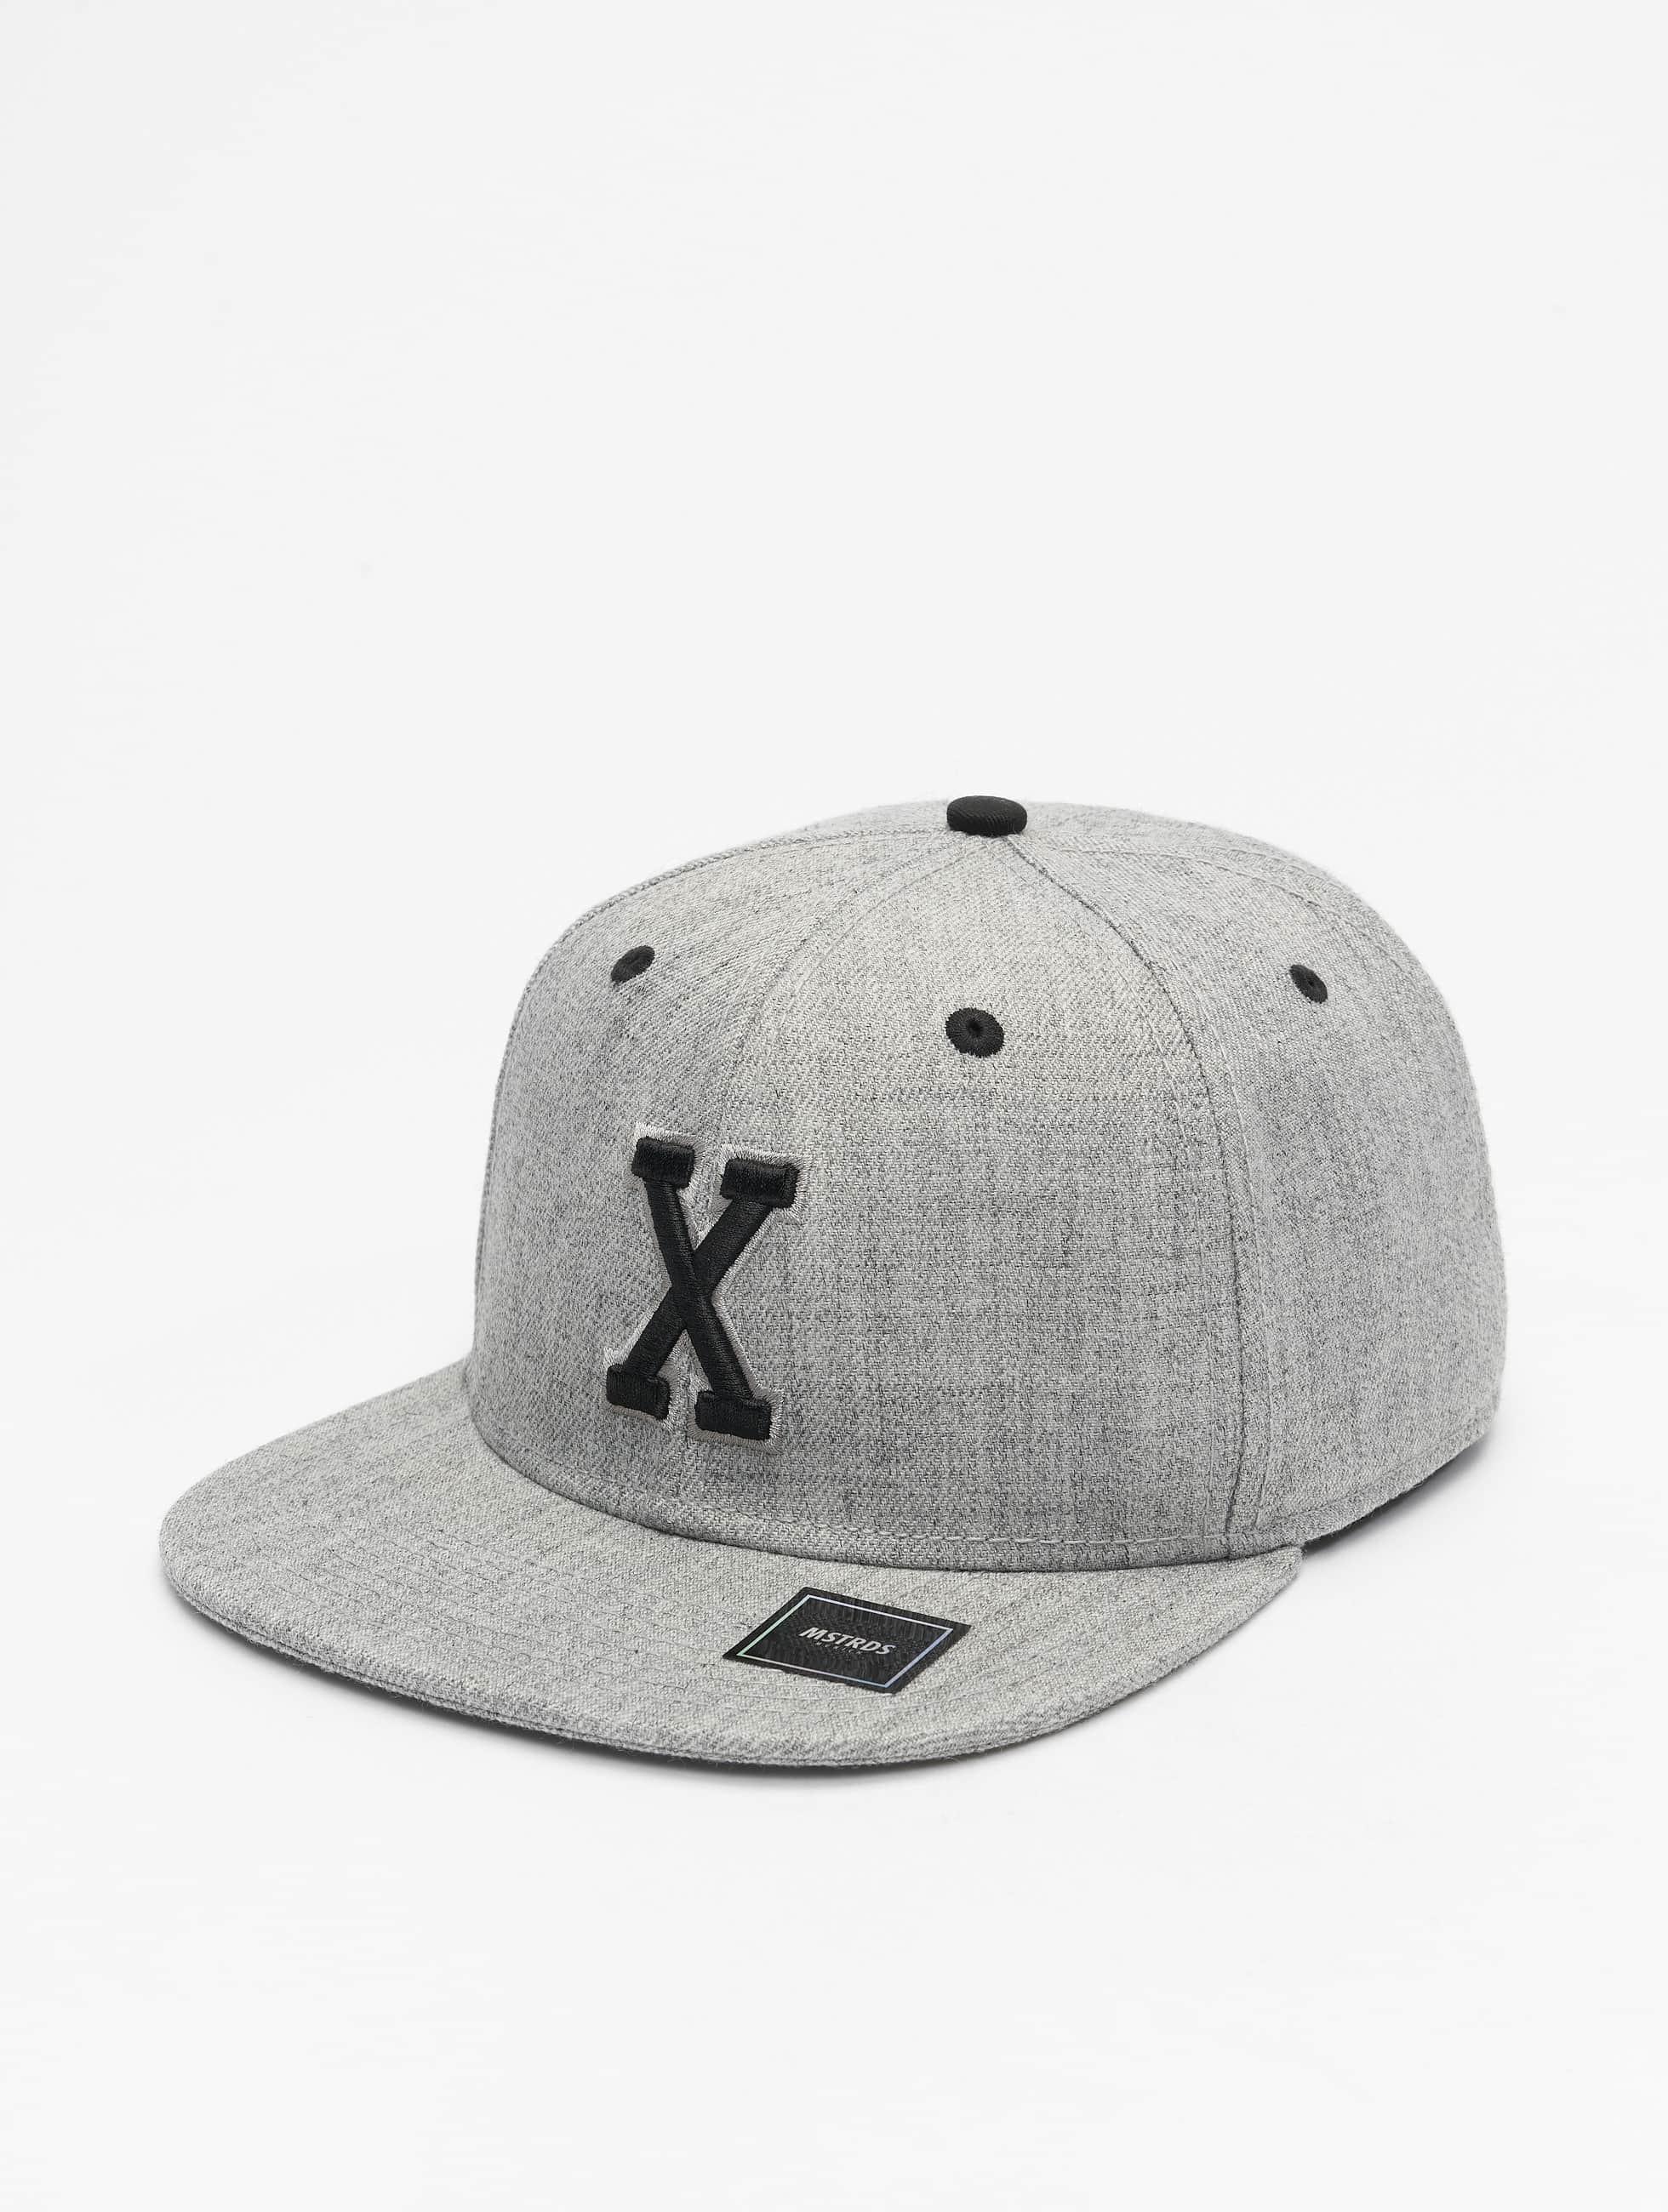 MSTRDS snapback cap X Letter grijs